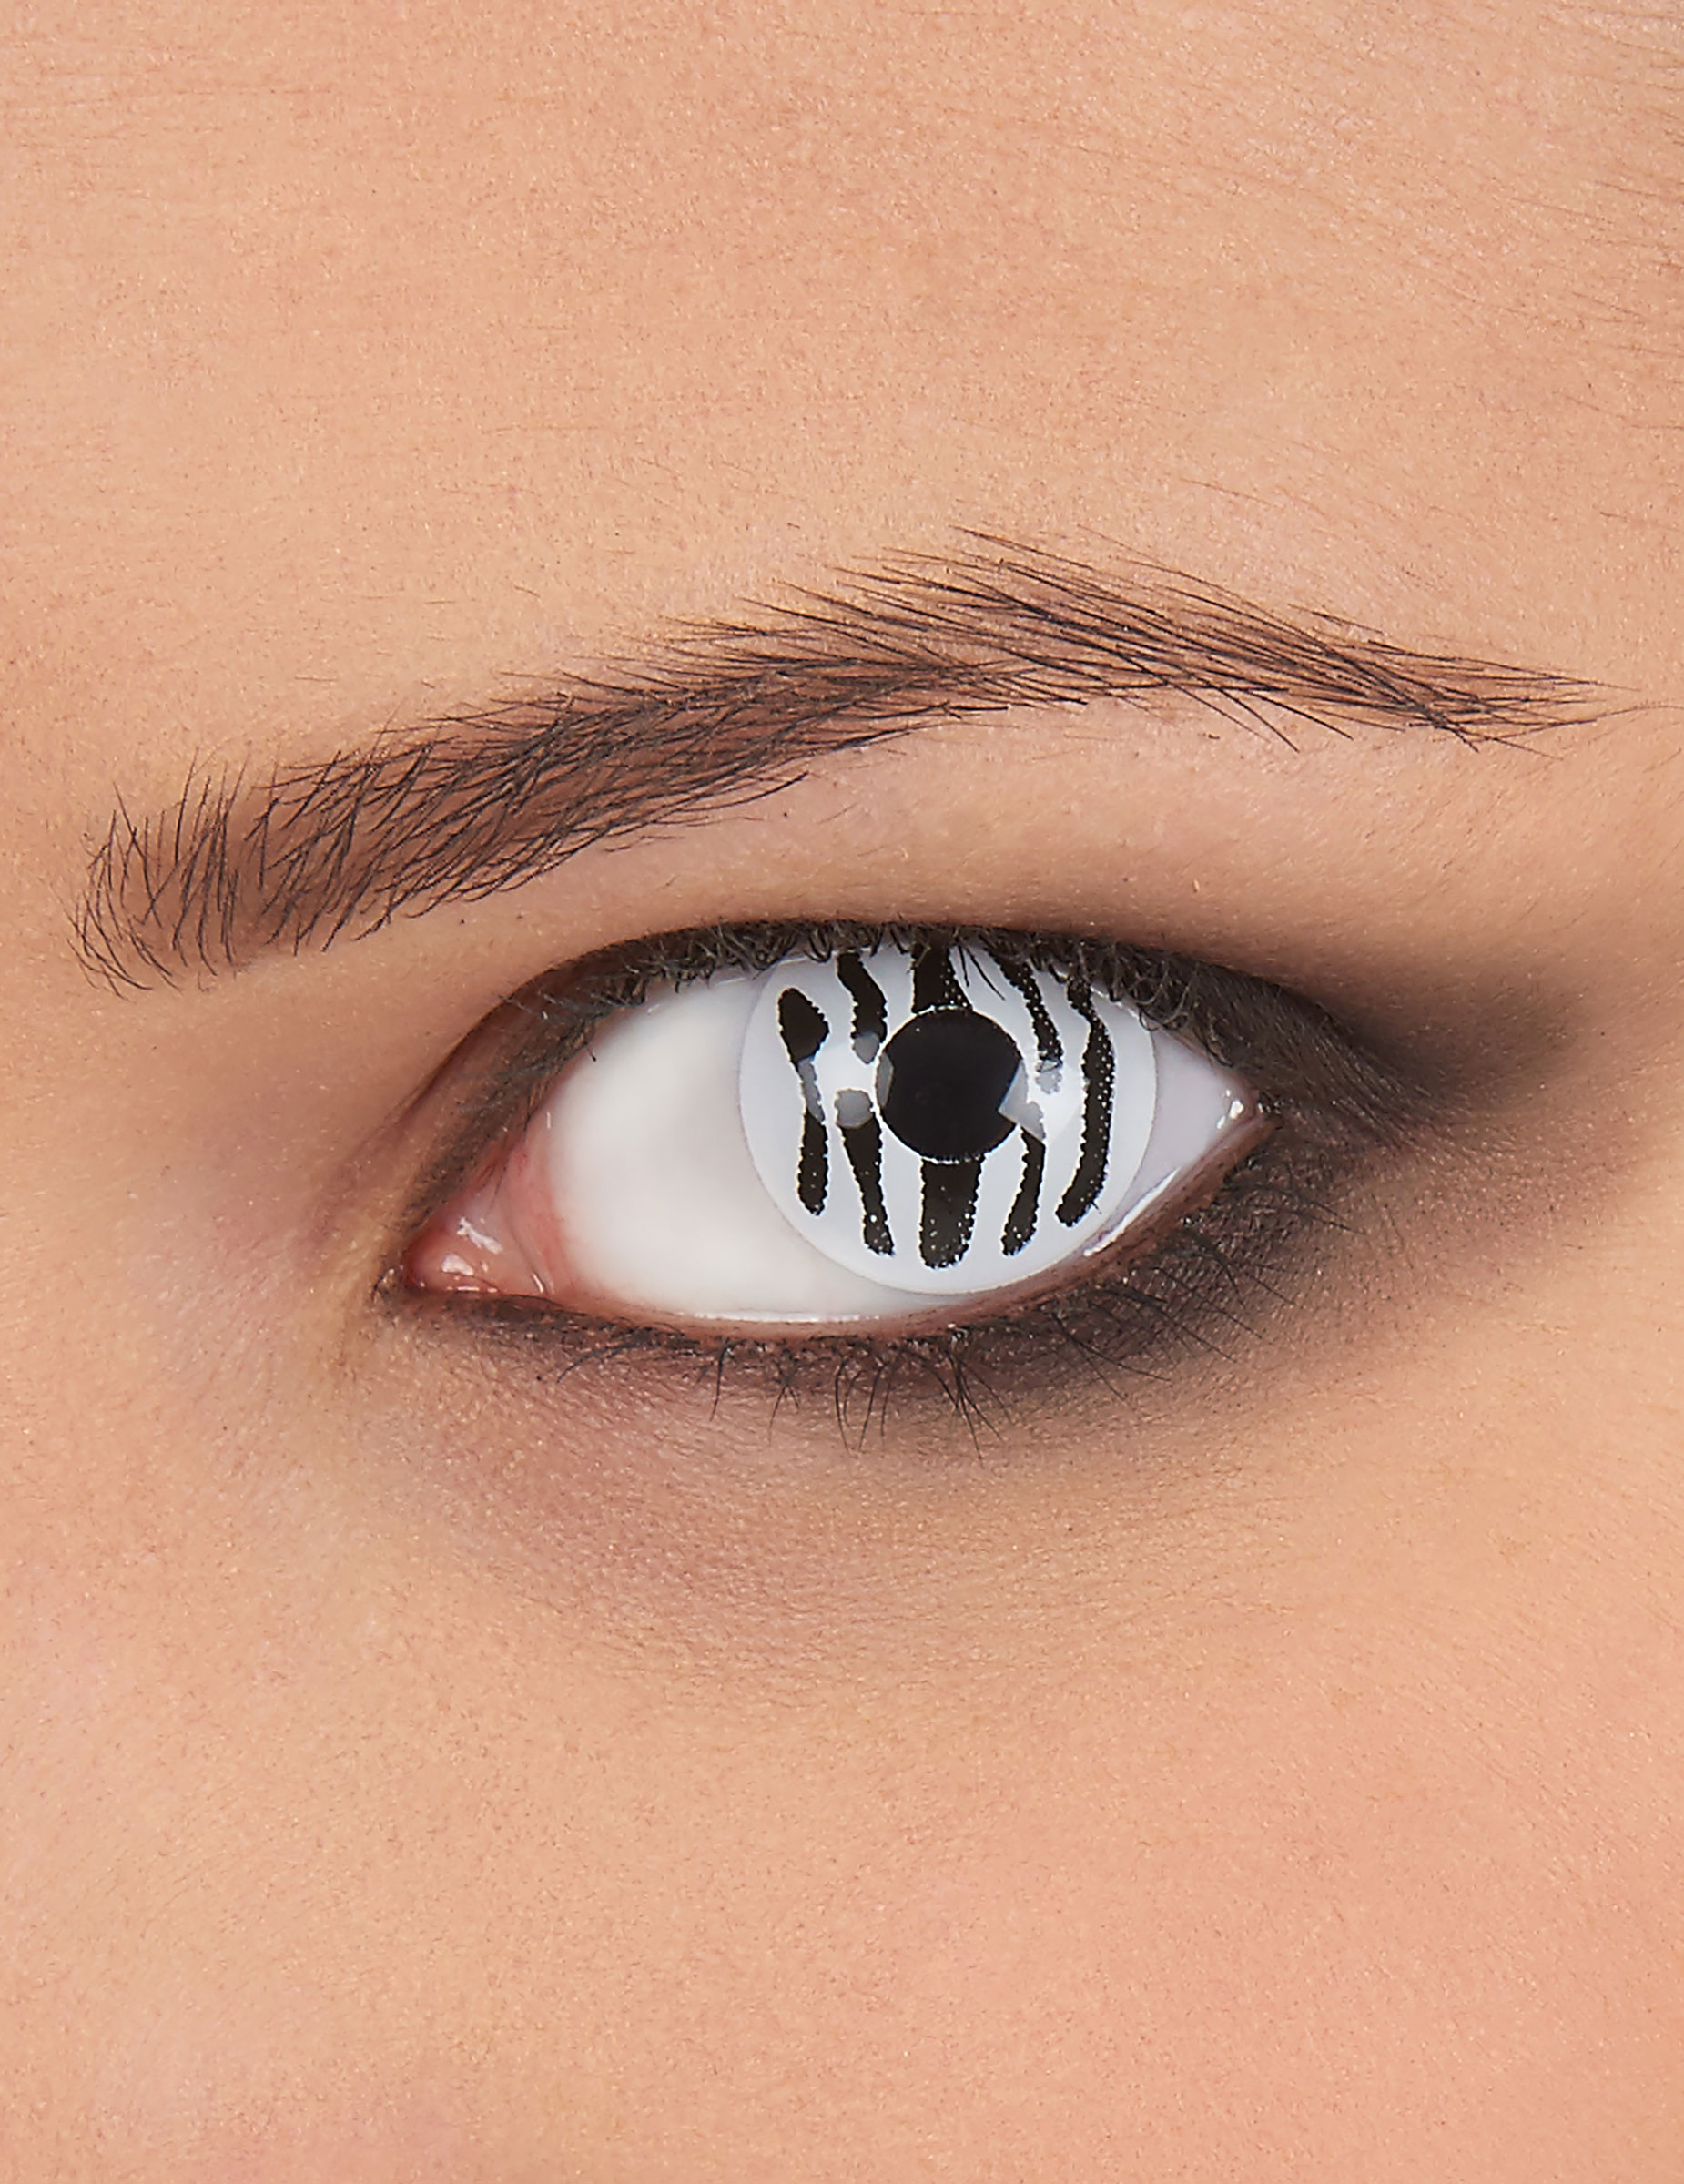 Kontaktlinsen Zebra Schminke Und Gunstige Faschingskostume Vegaoo